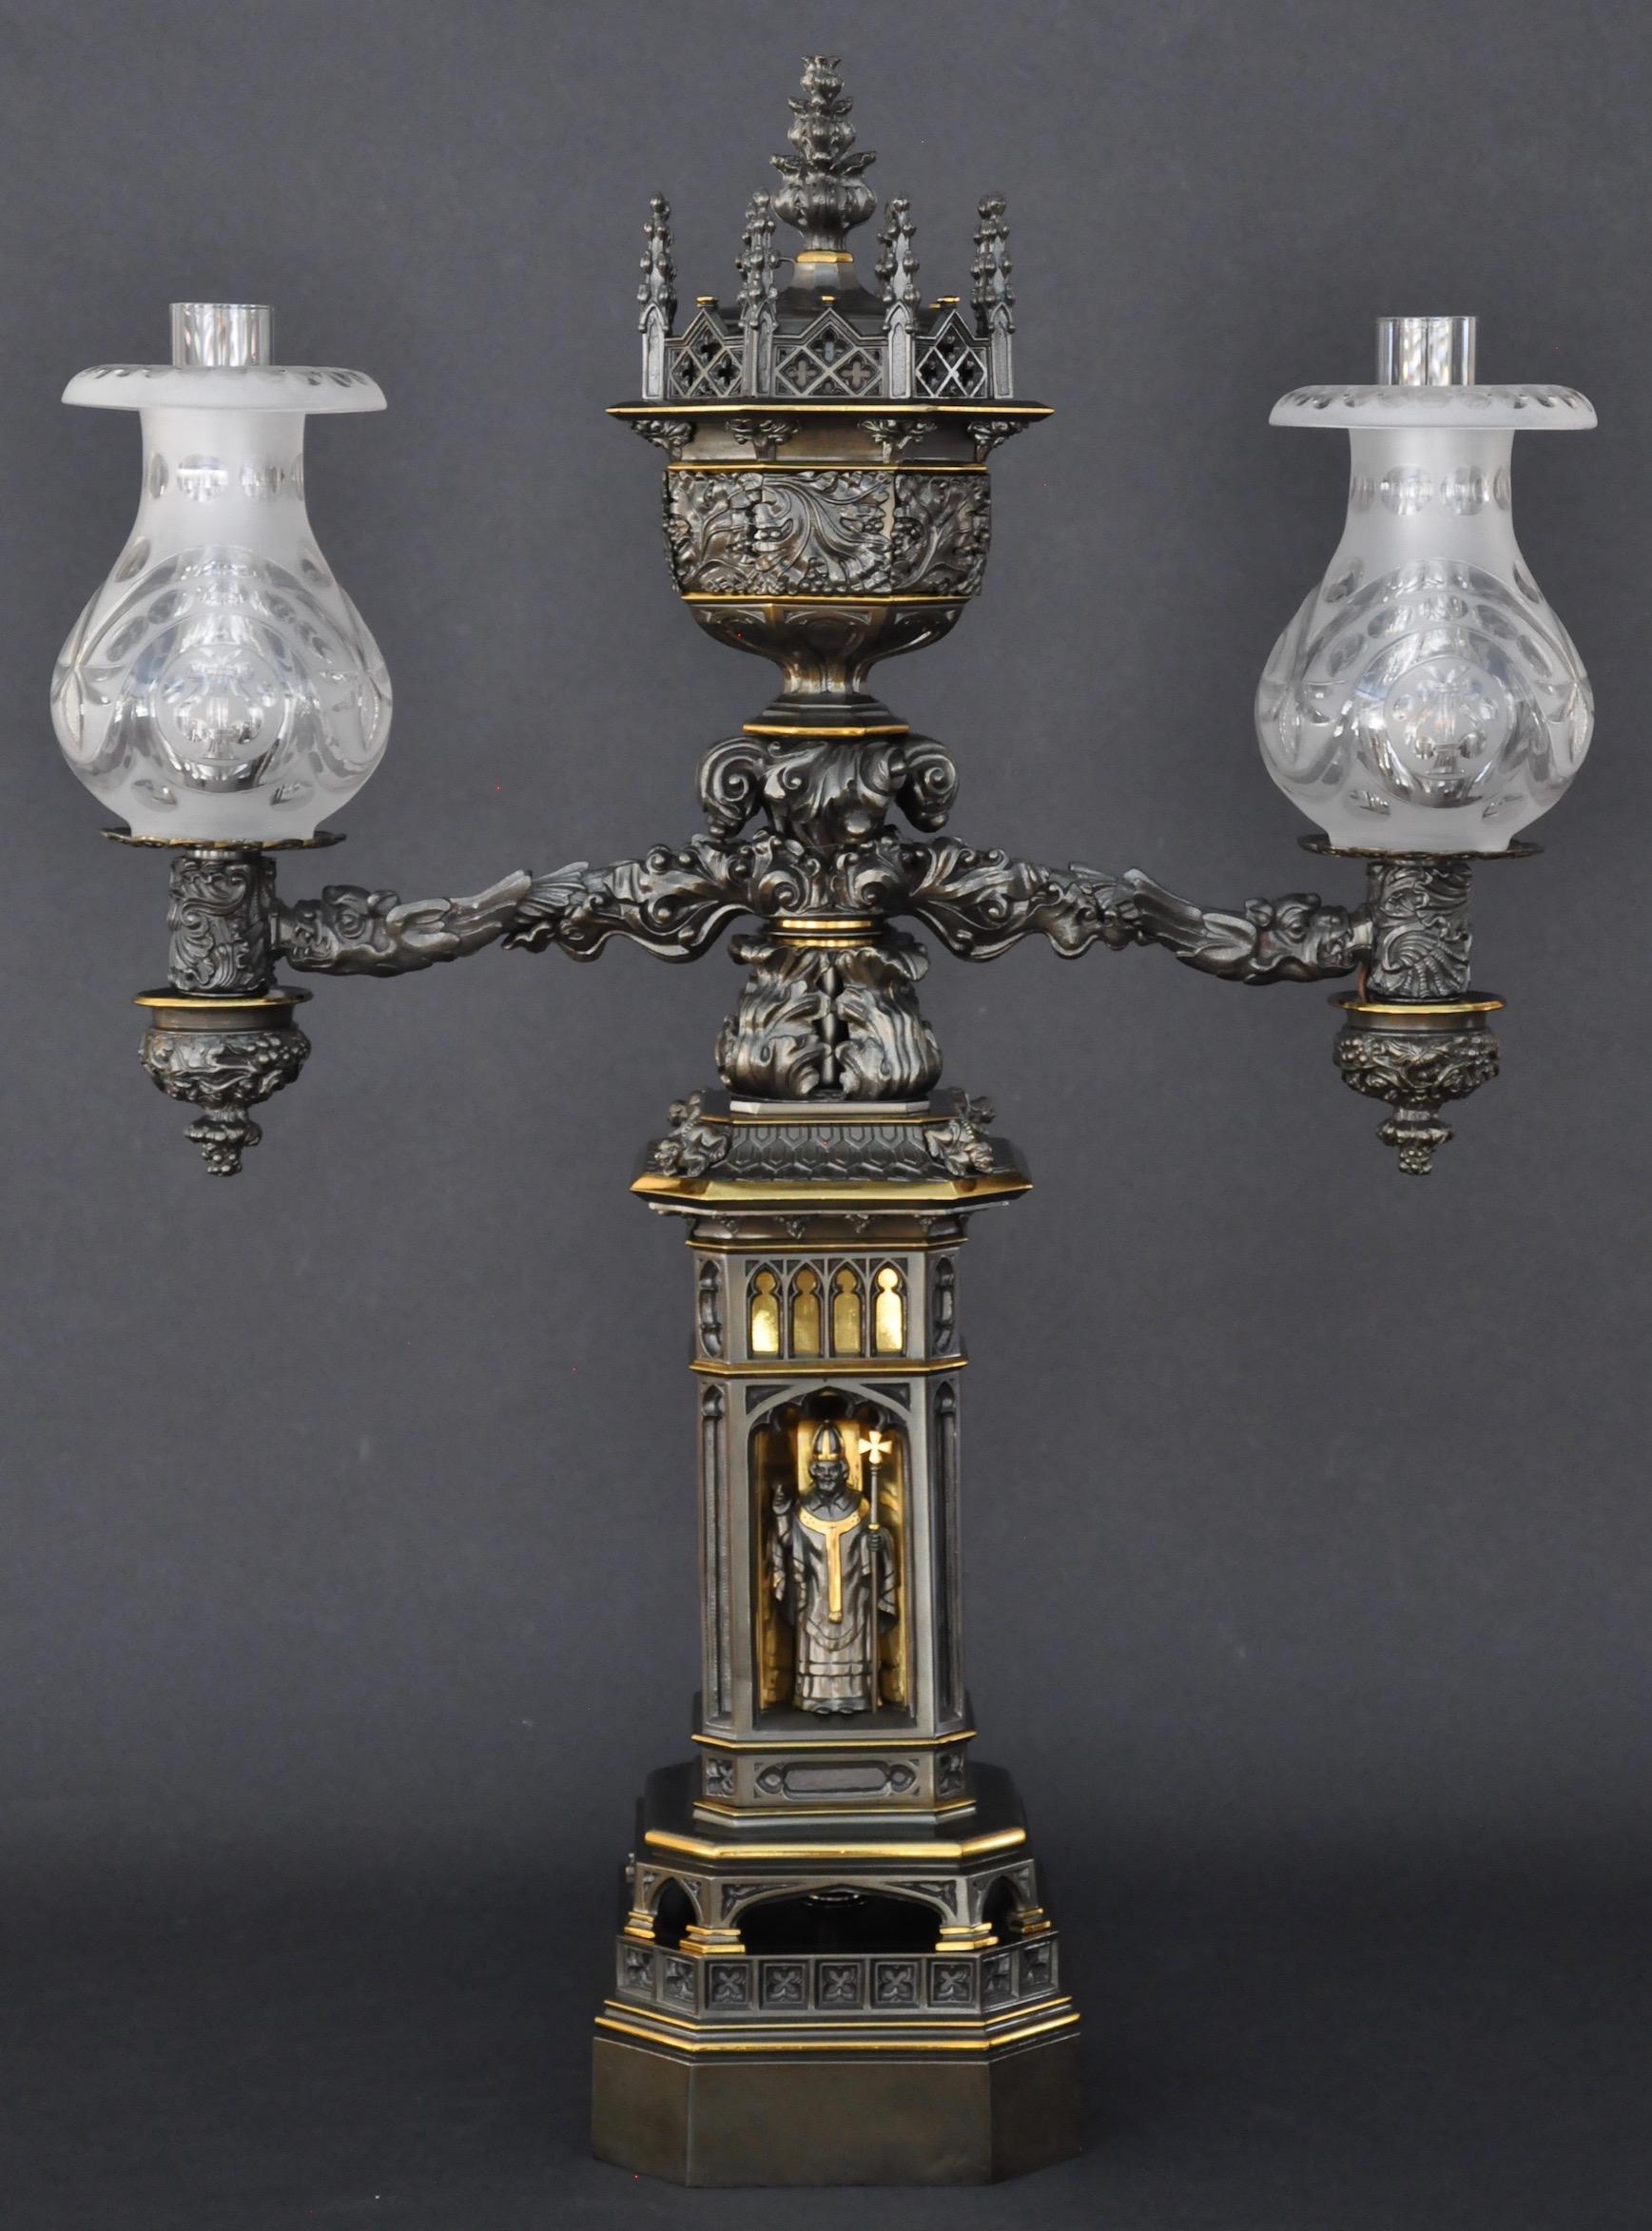 A Pair of Regency Candlesticks - Charles Clark